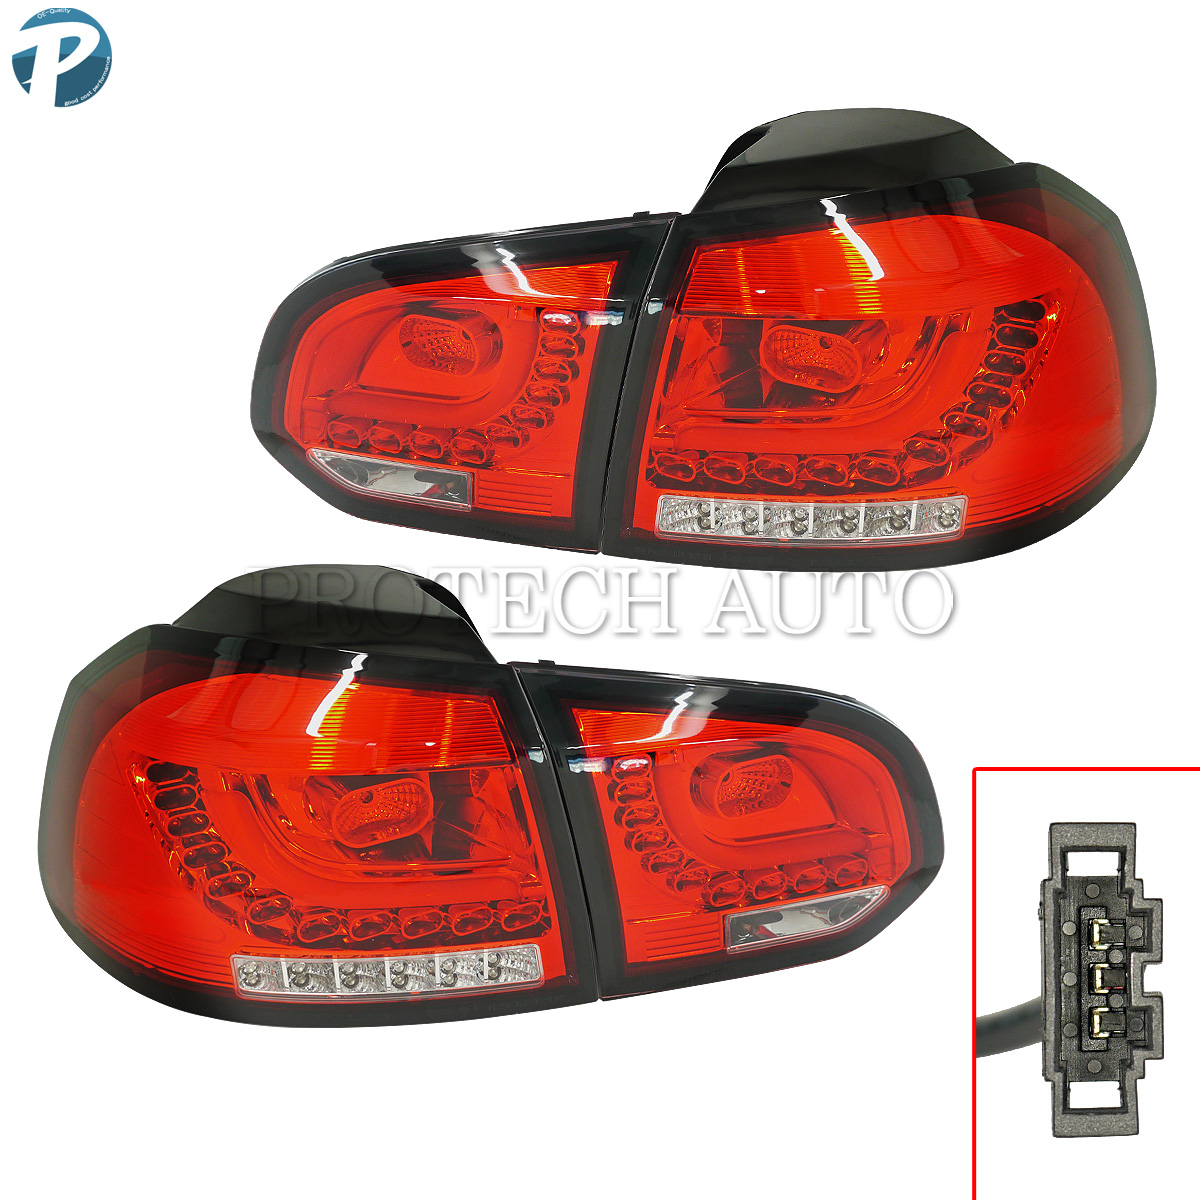 VW フォルクスワーゲン Golf VI ゴルフ6 LED テールランプ/テールライト/テールレンズ バックフォグランプ付き 左右セット 2009年式以降【】